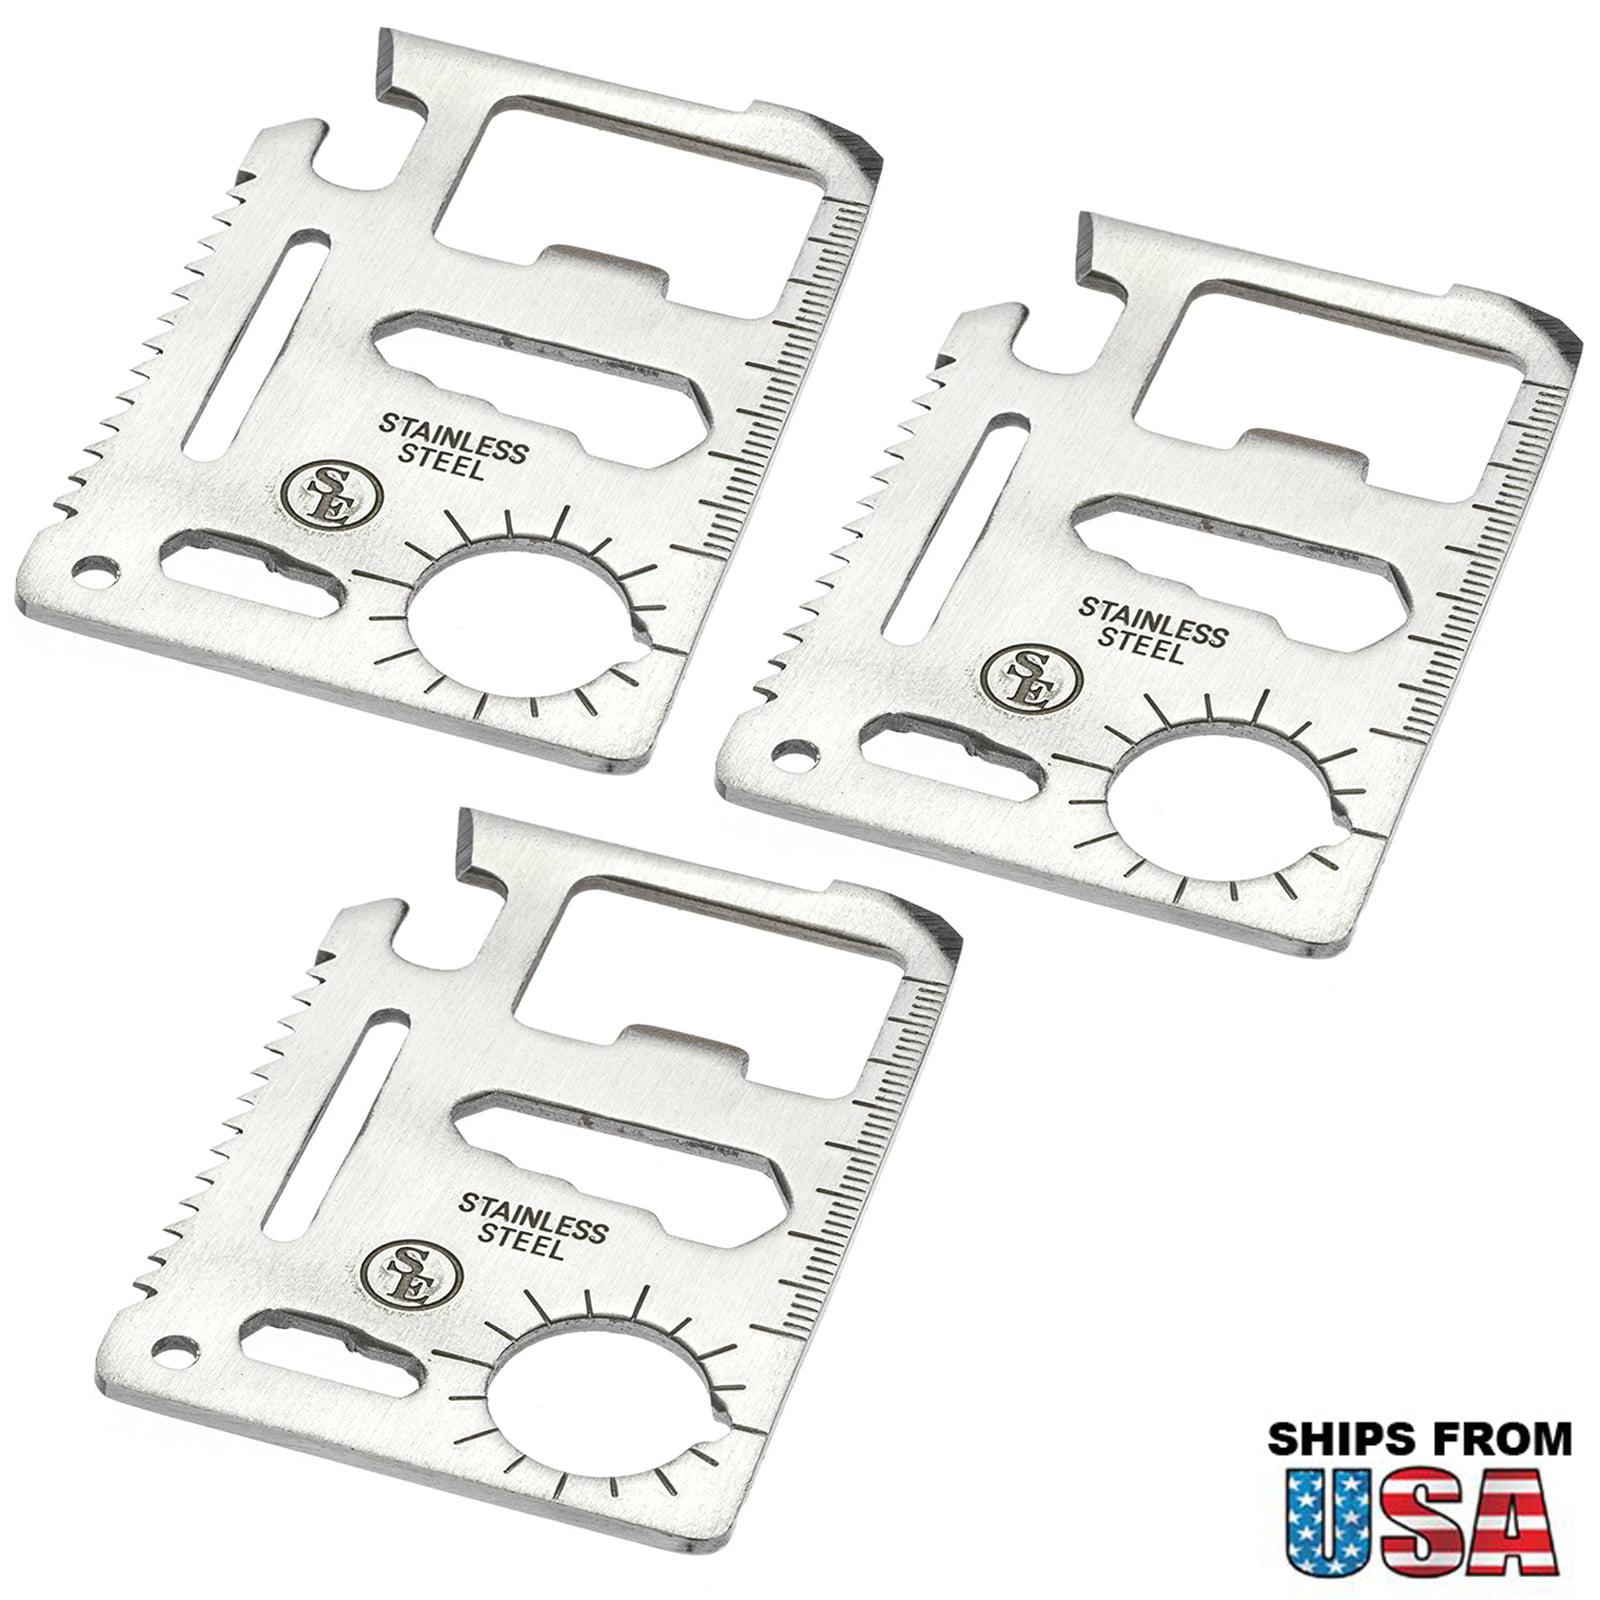 3pc SE Professional MT908 11 Function Survival Pocket Tool FAST USA SHIP